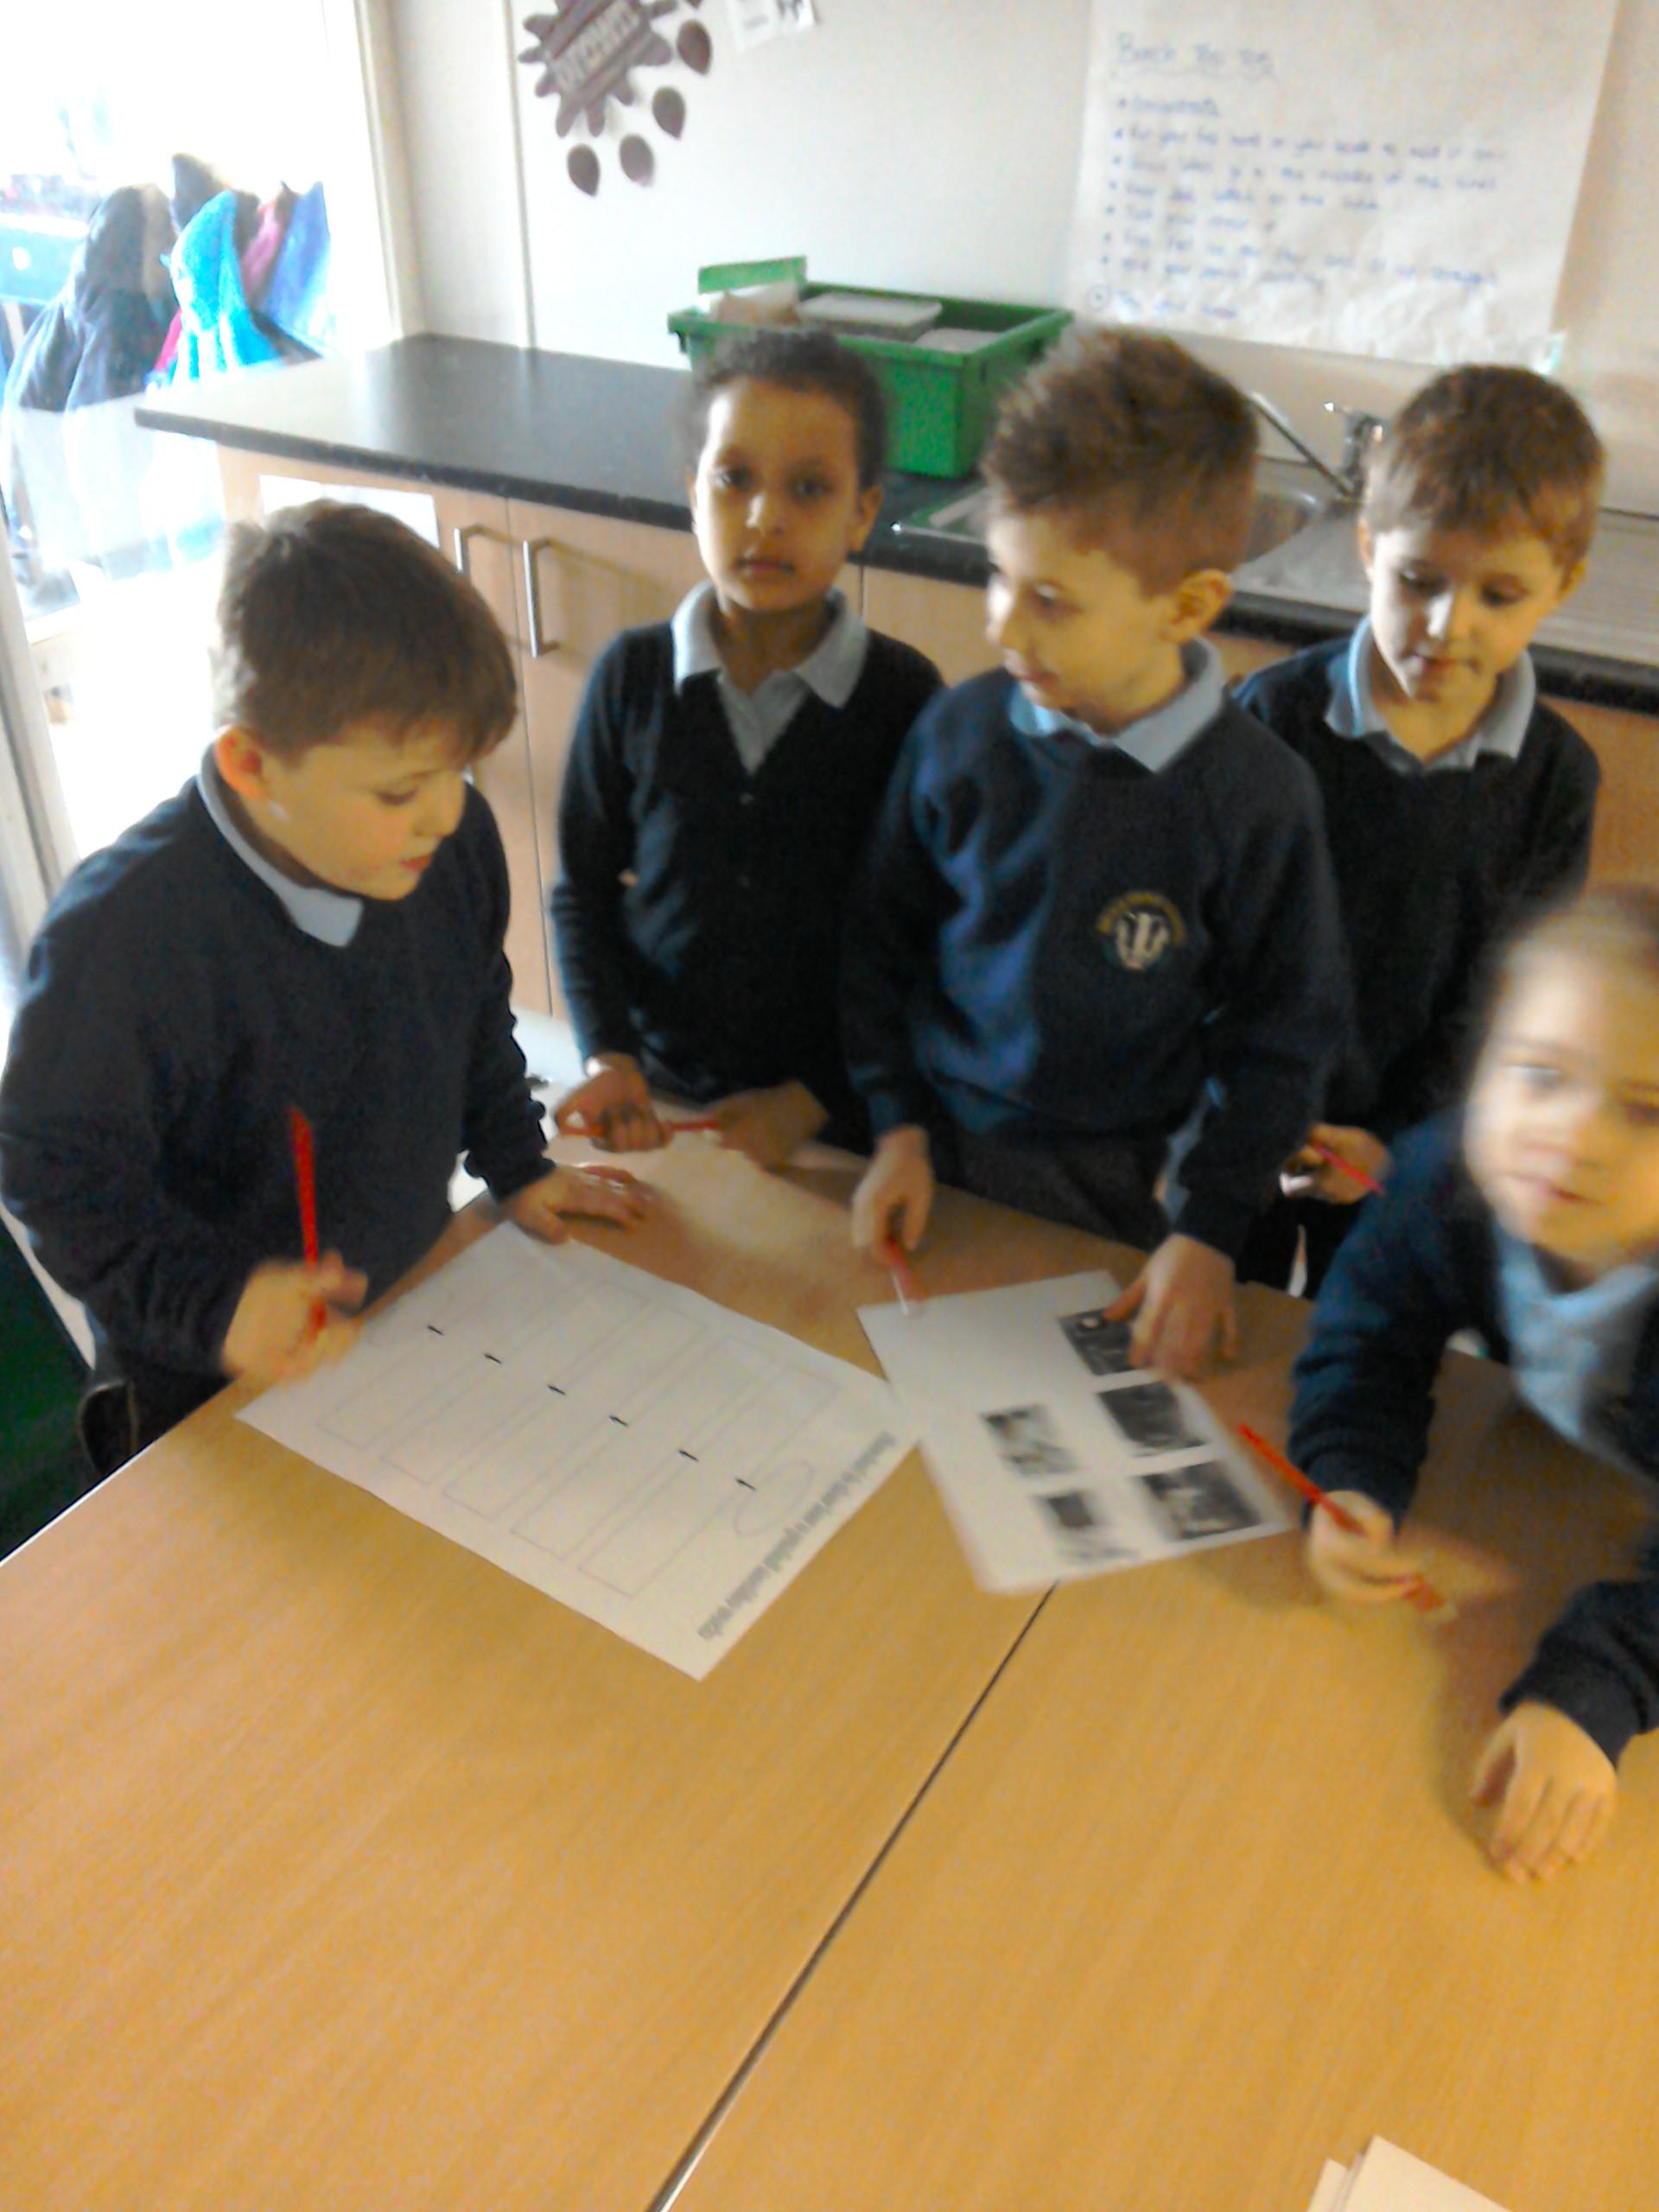 Uncategorized: Brockswood Primary & Nursery School